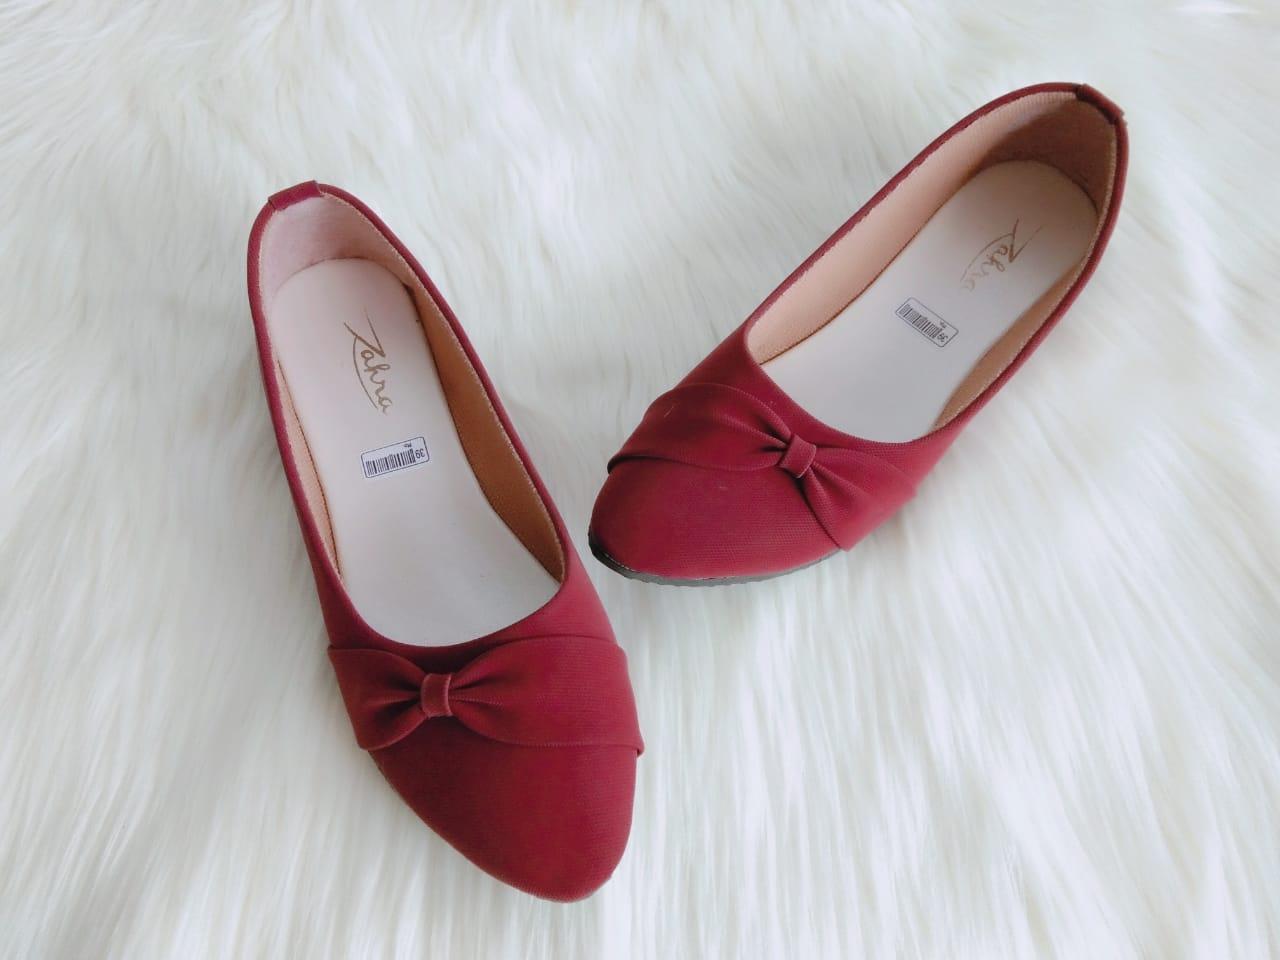 Arlaine - Keyko Flat Shoes